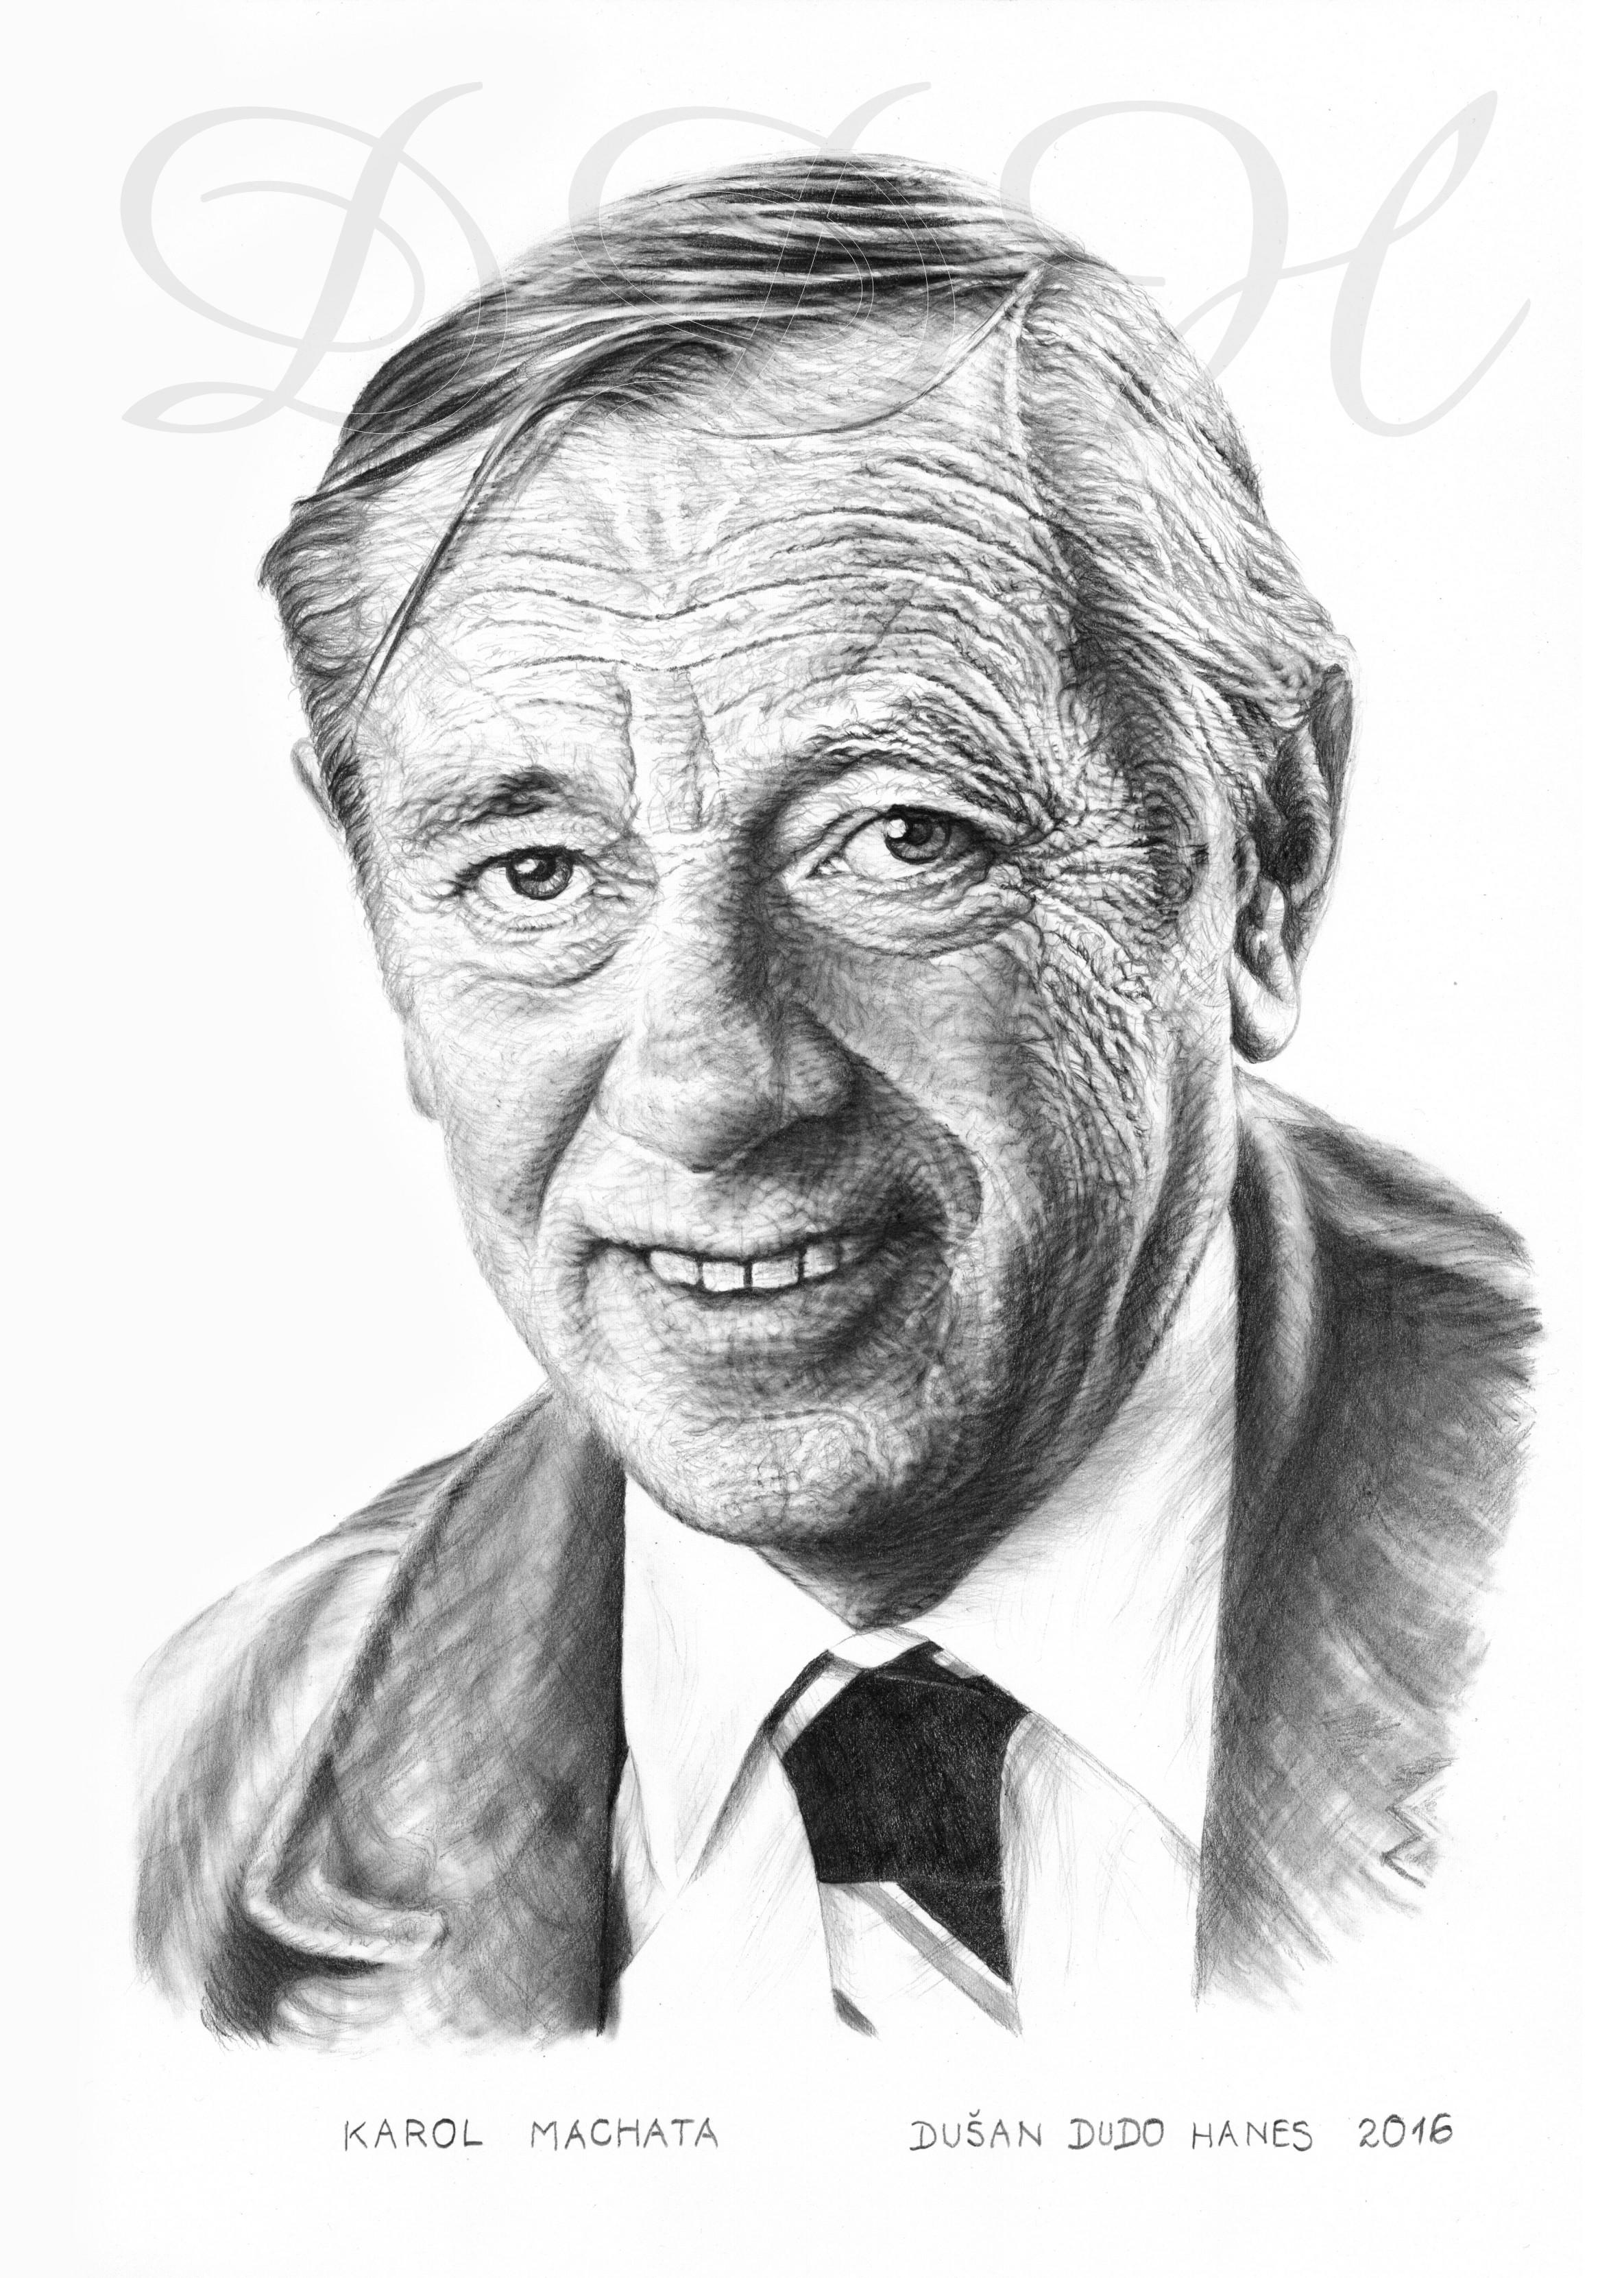 116 - Karol Machata, portrét Dušan Dudo Hanes